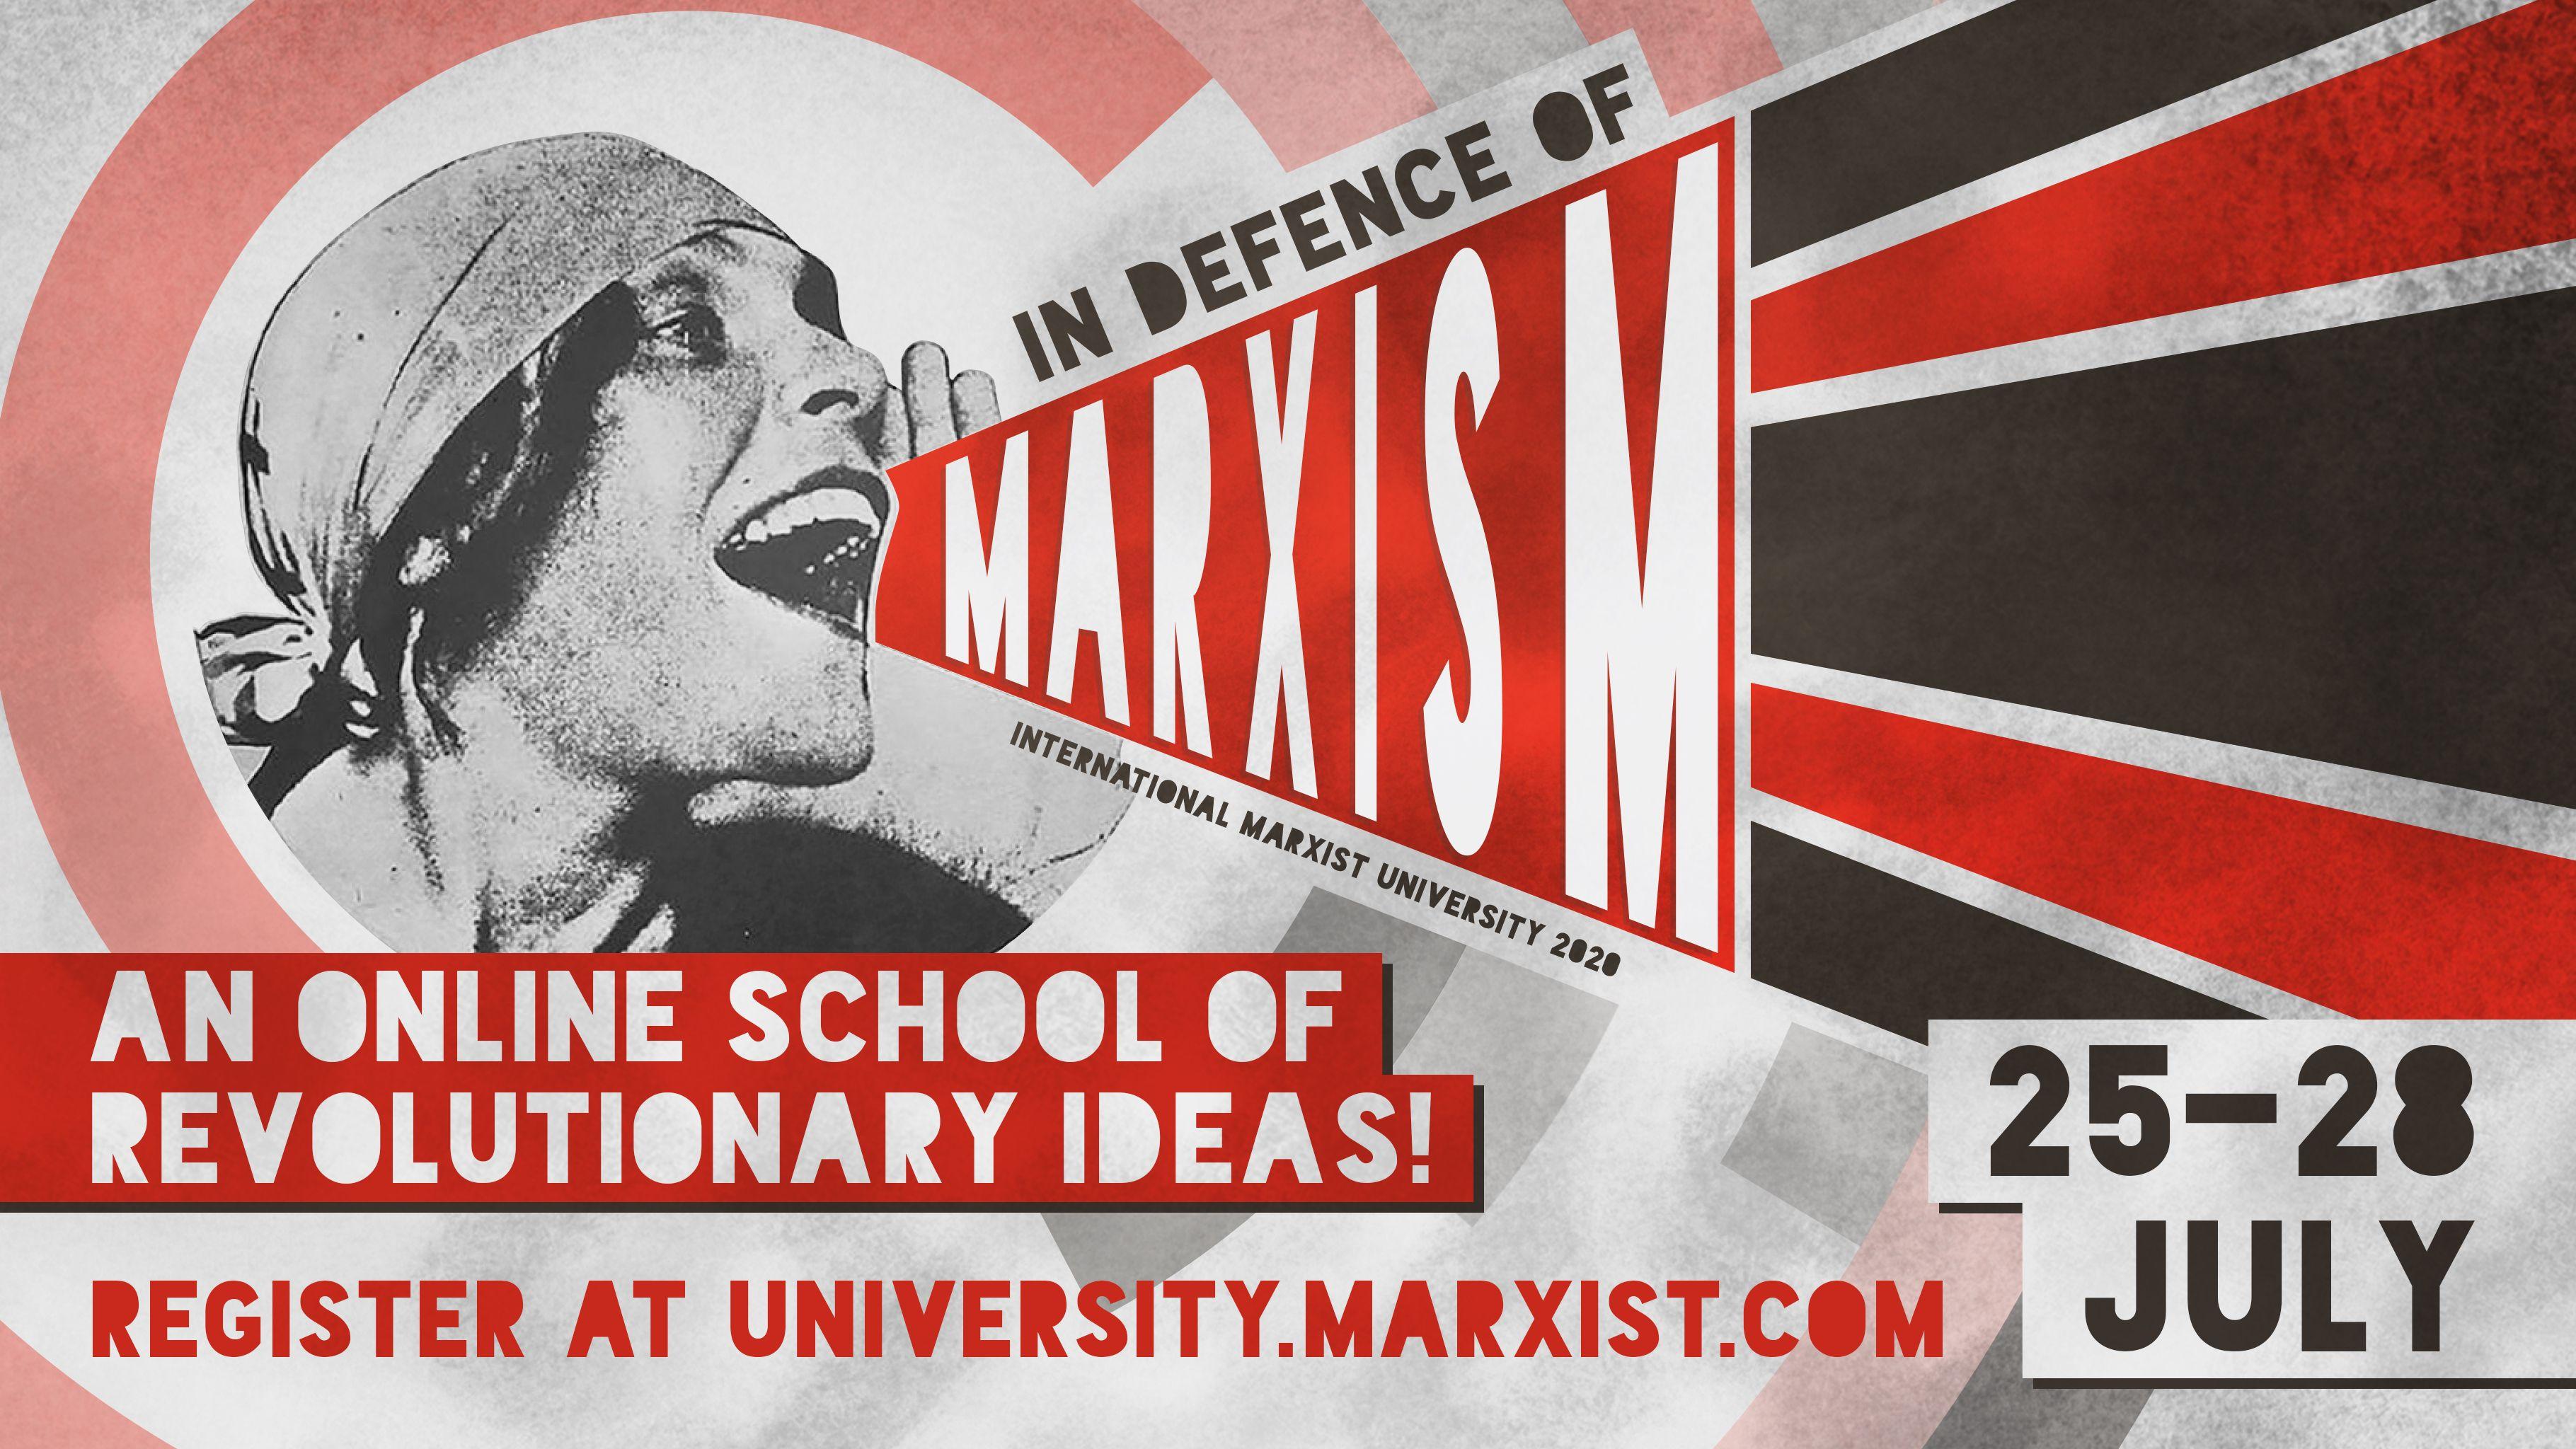 International Marxist University 2020